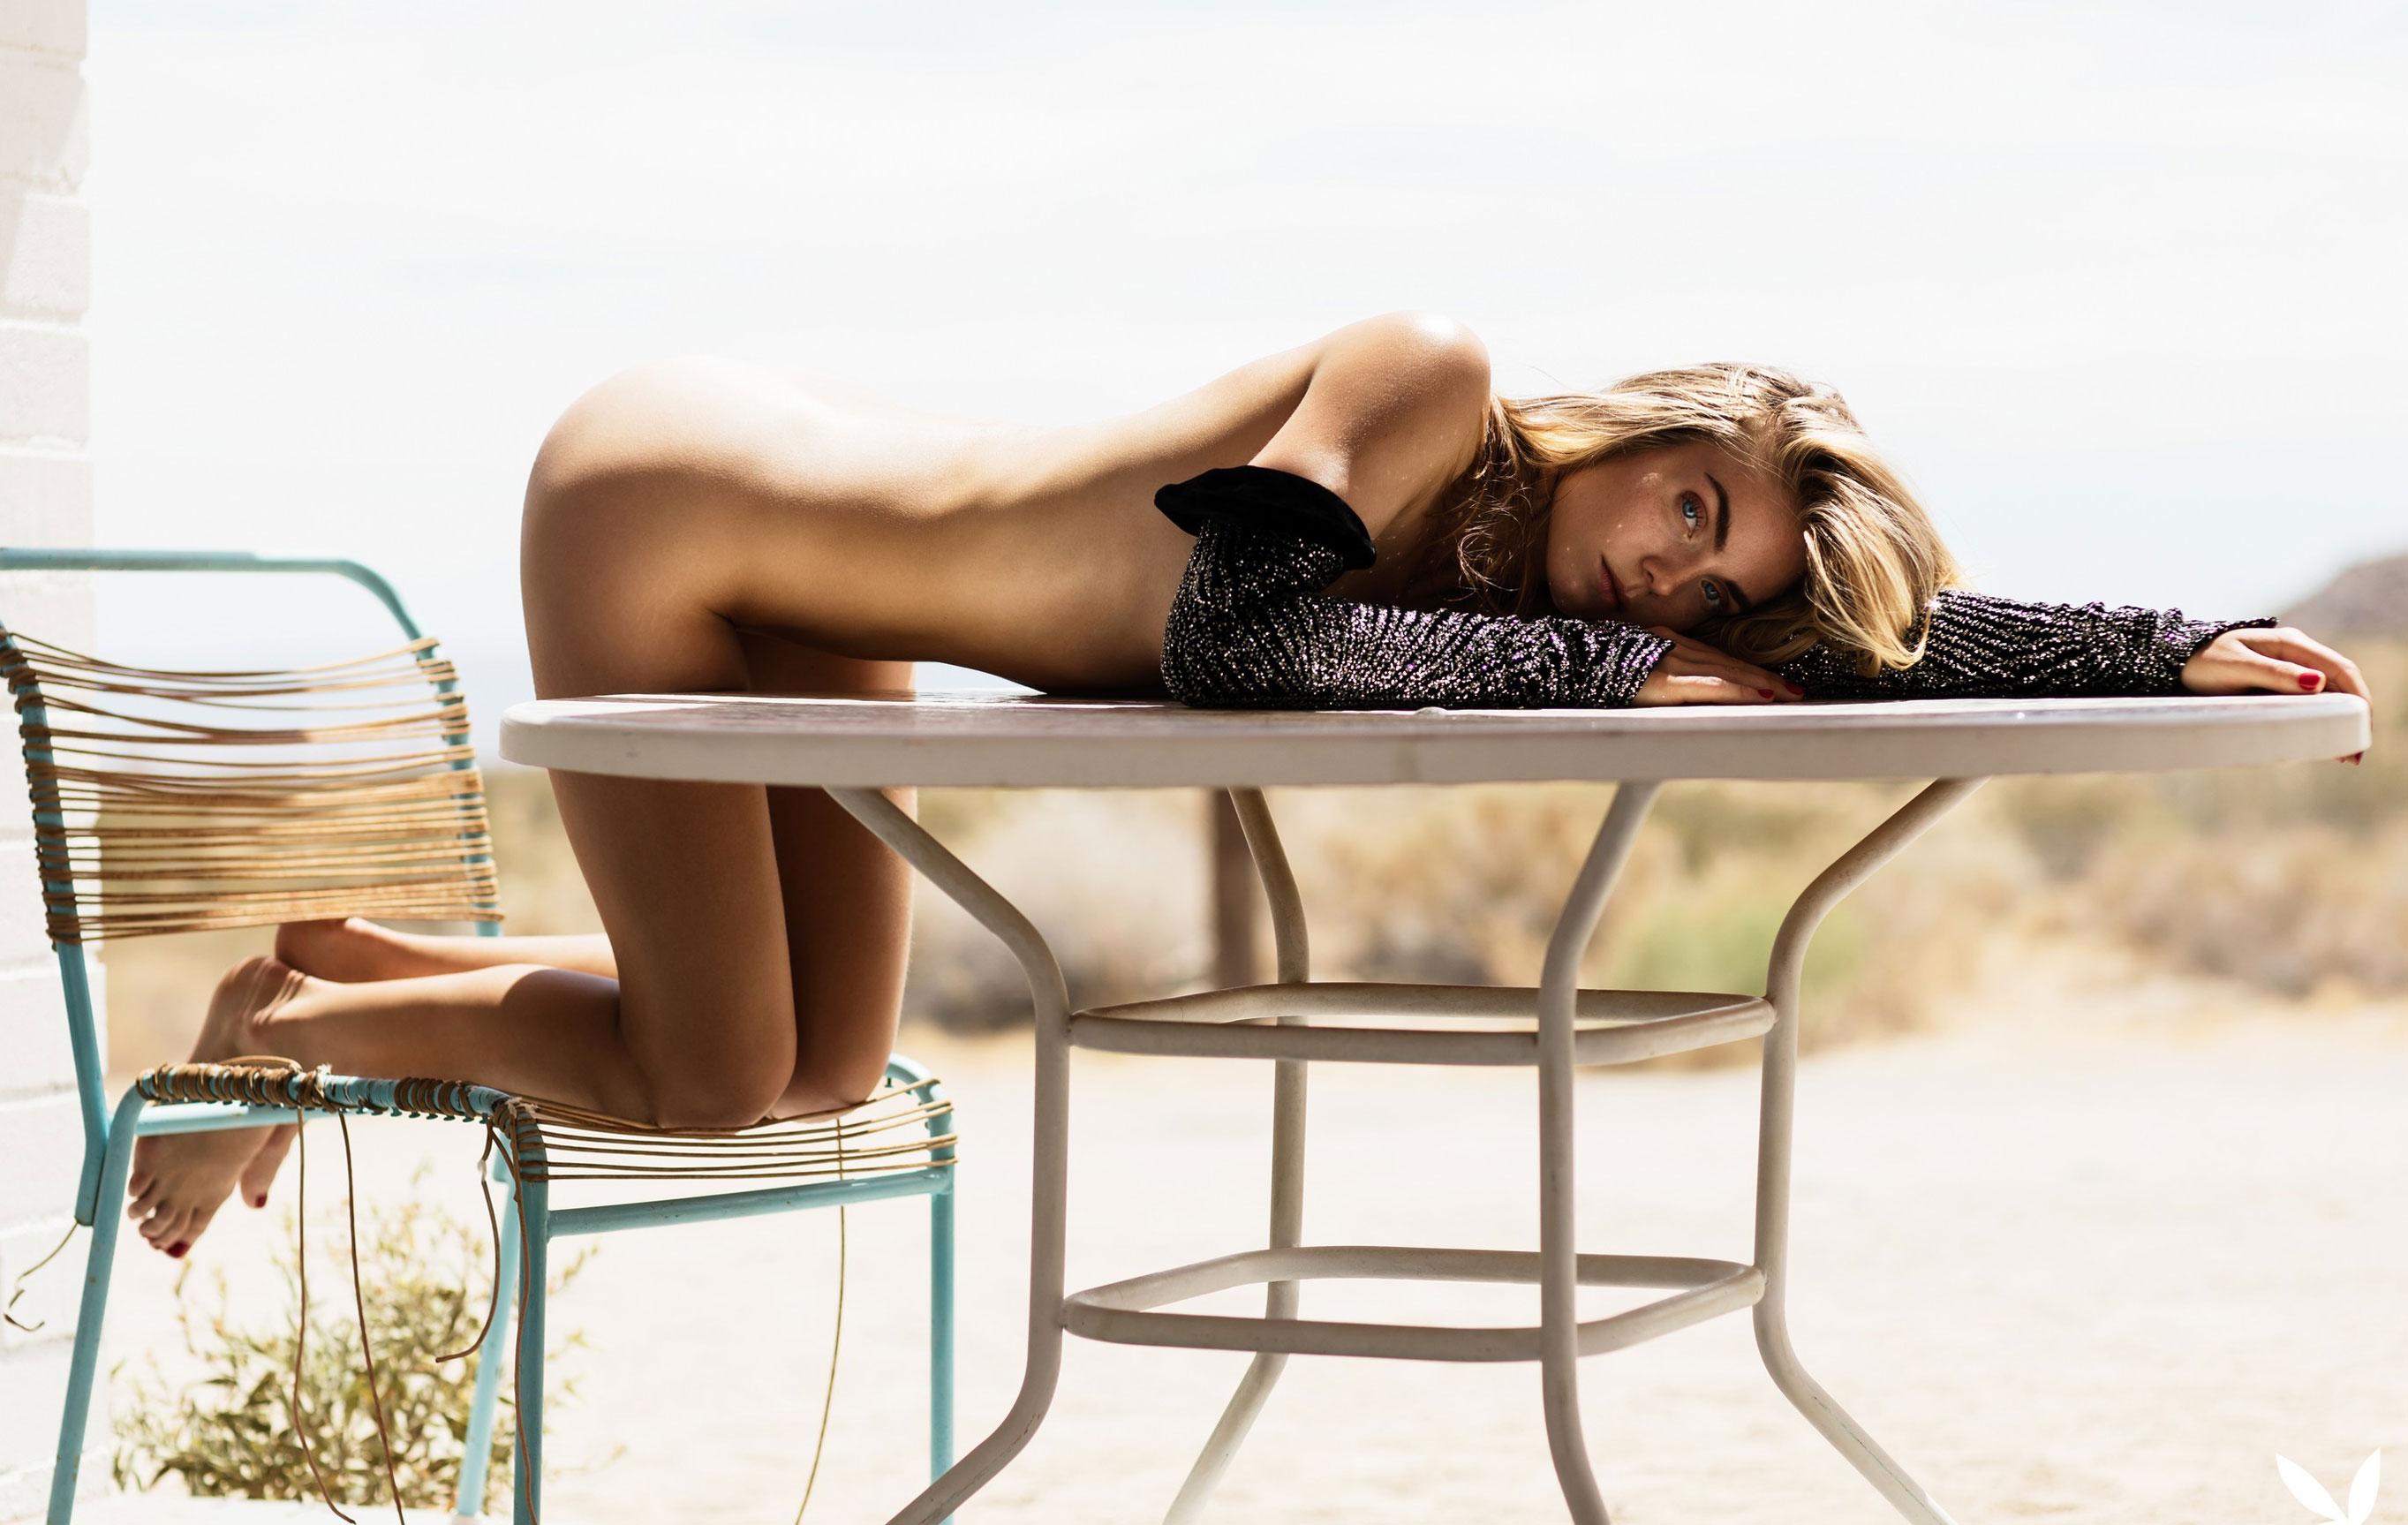 Девушка месяца Playboy USA Джорди Мюррэй / фото 01